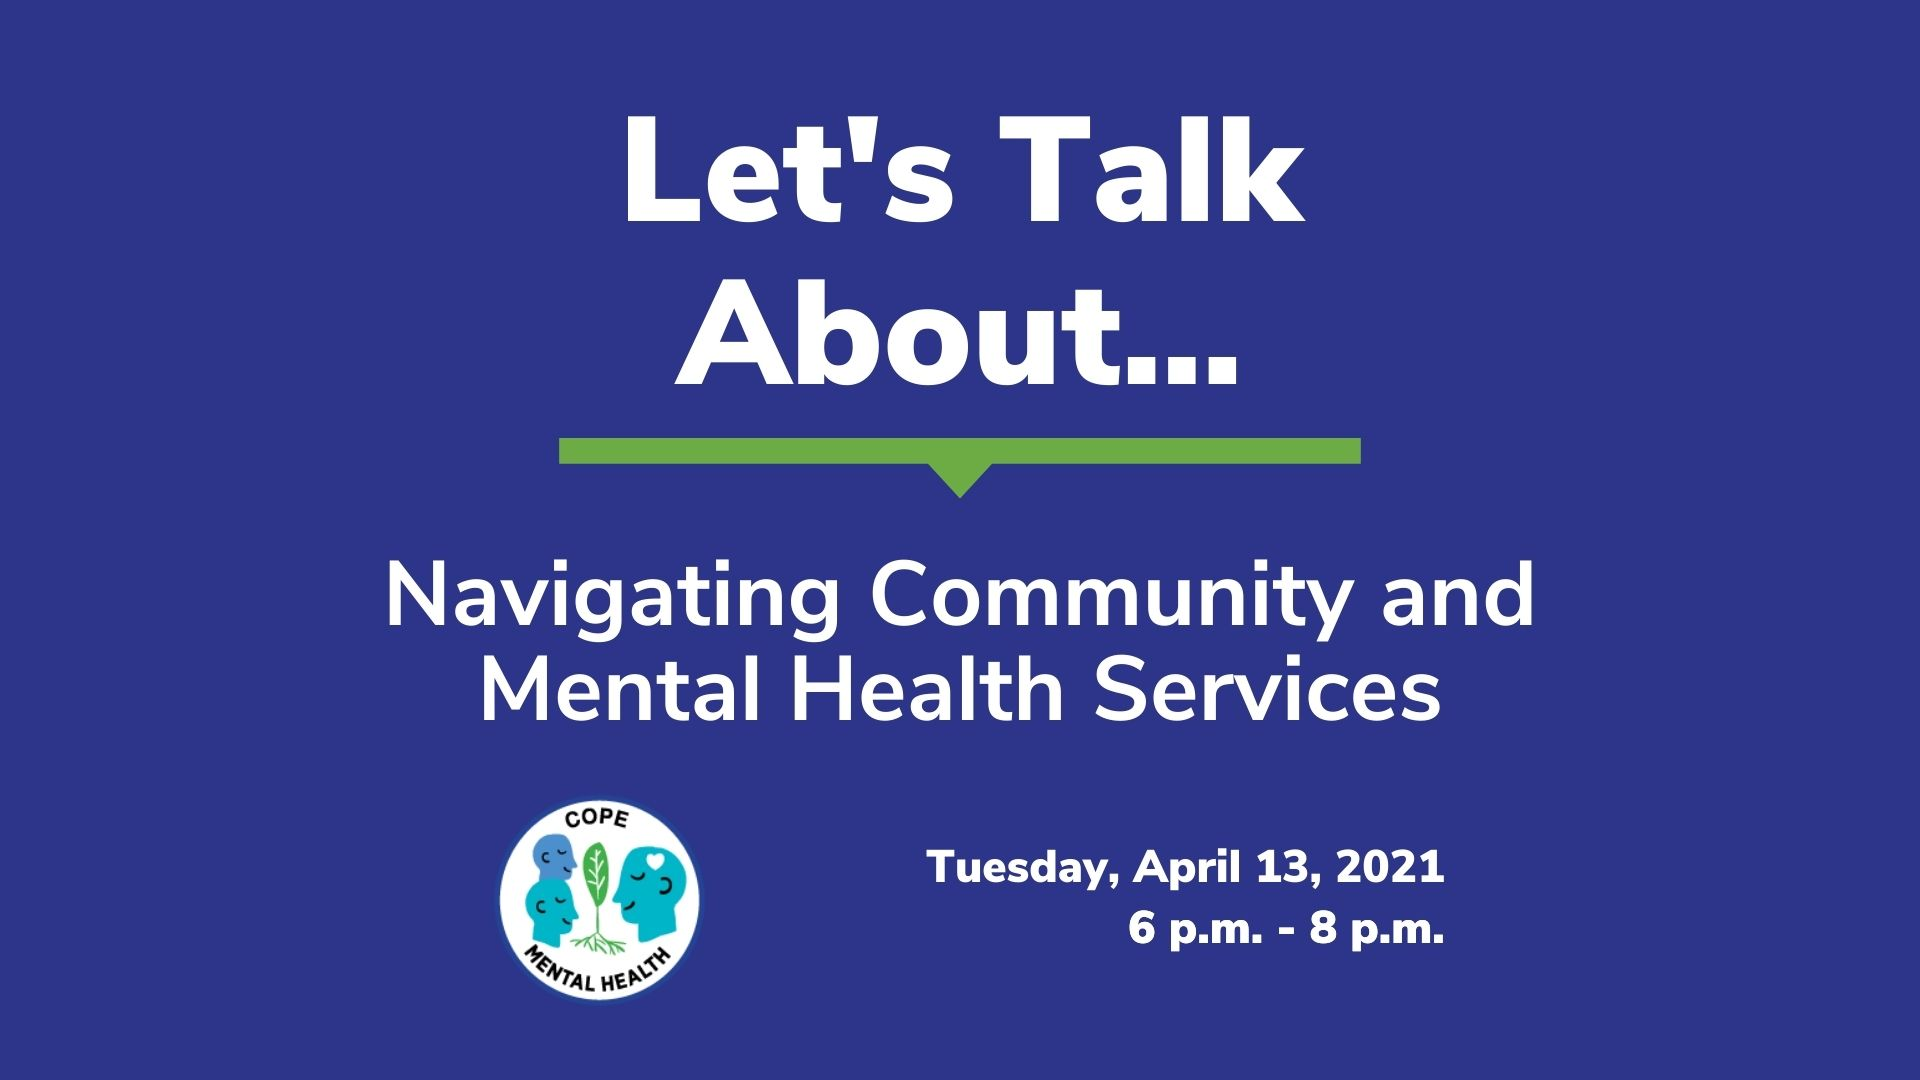 Let's Talk About Navigating Mental Health Services